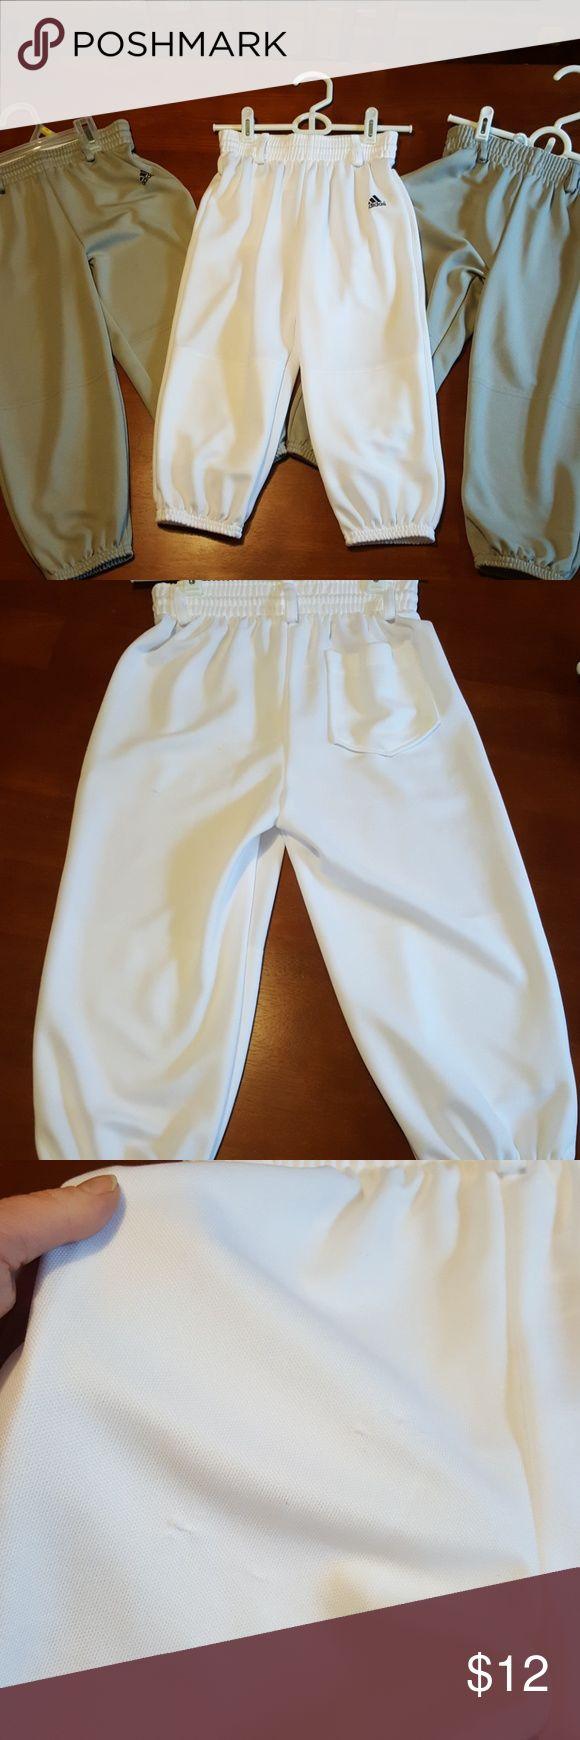 Adidas Climalite Beltloop Baseball Pants Small EUC Adidas Baseball Pants. No stains. Picked area on white pants shown in pic. Smoke free home. adidas Bottoms